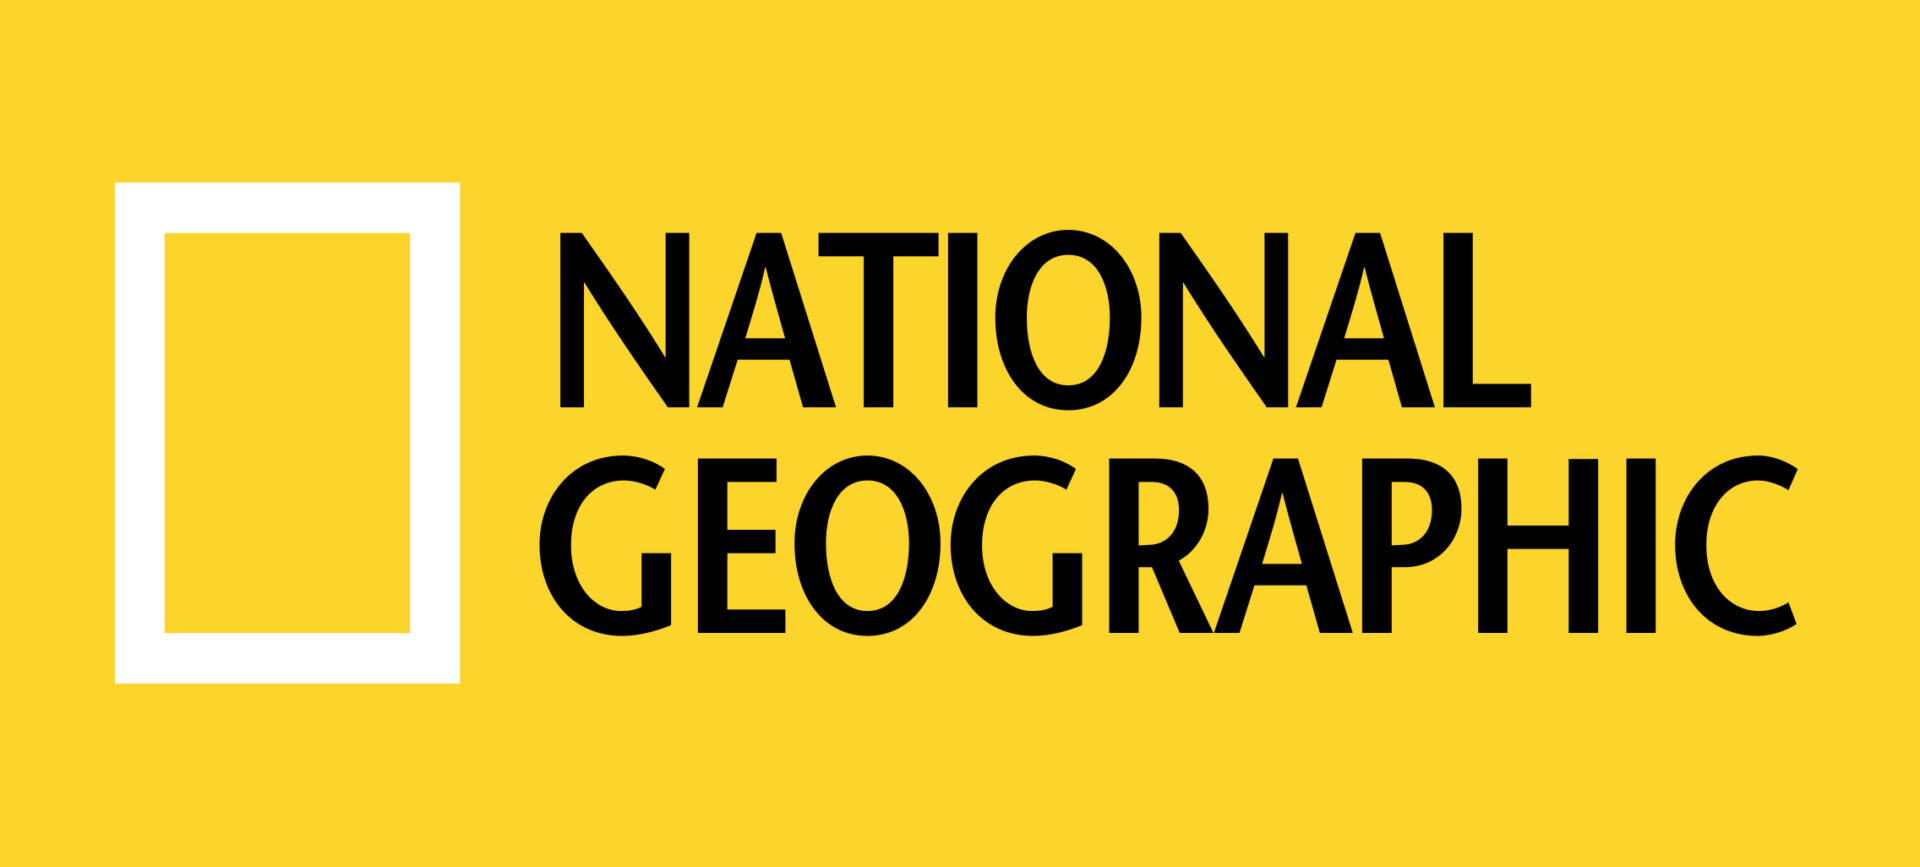 national-geographic-symbol